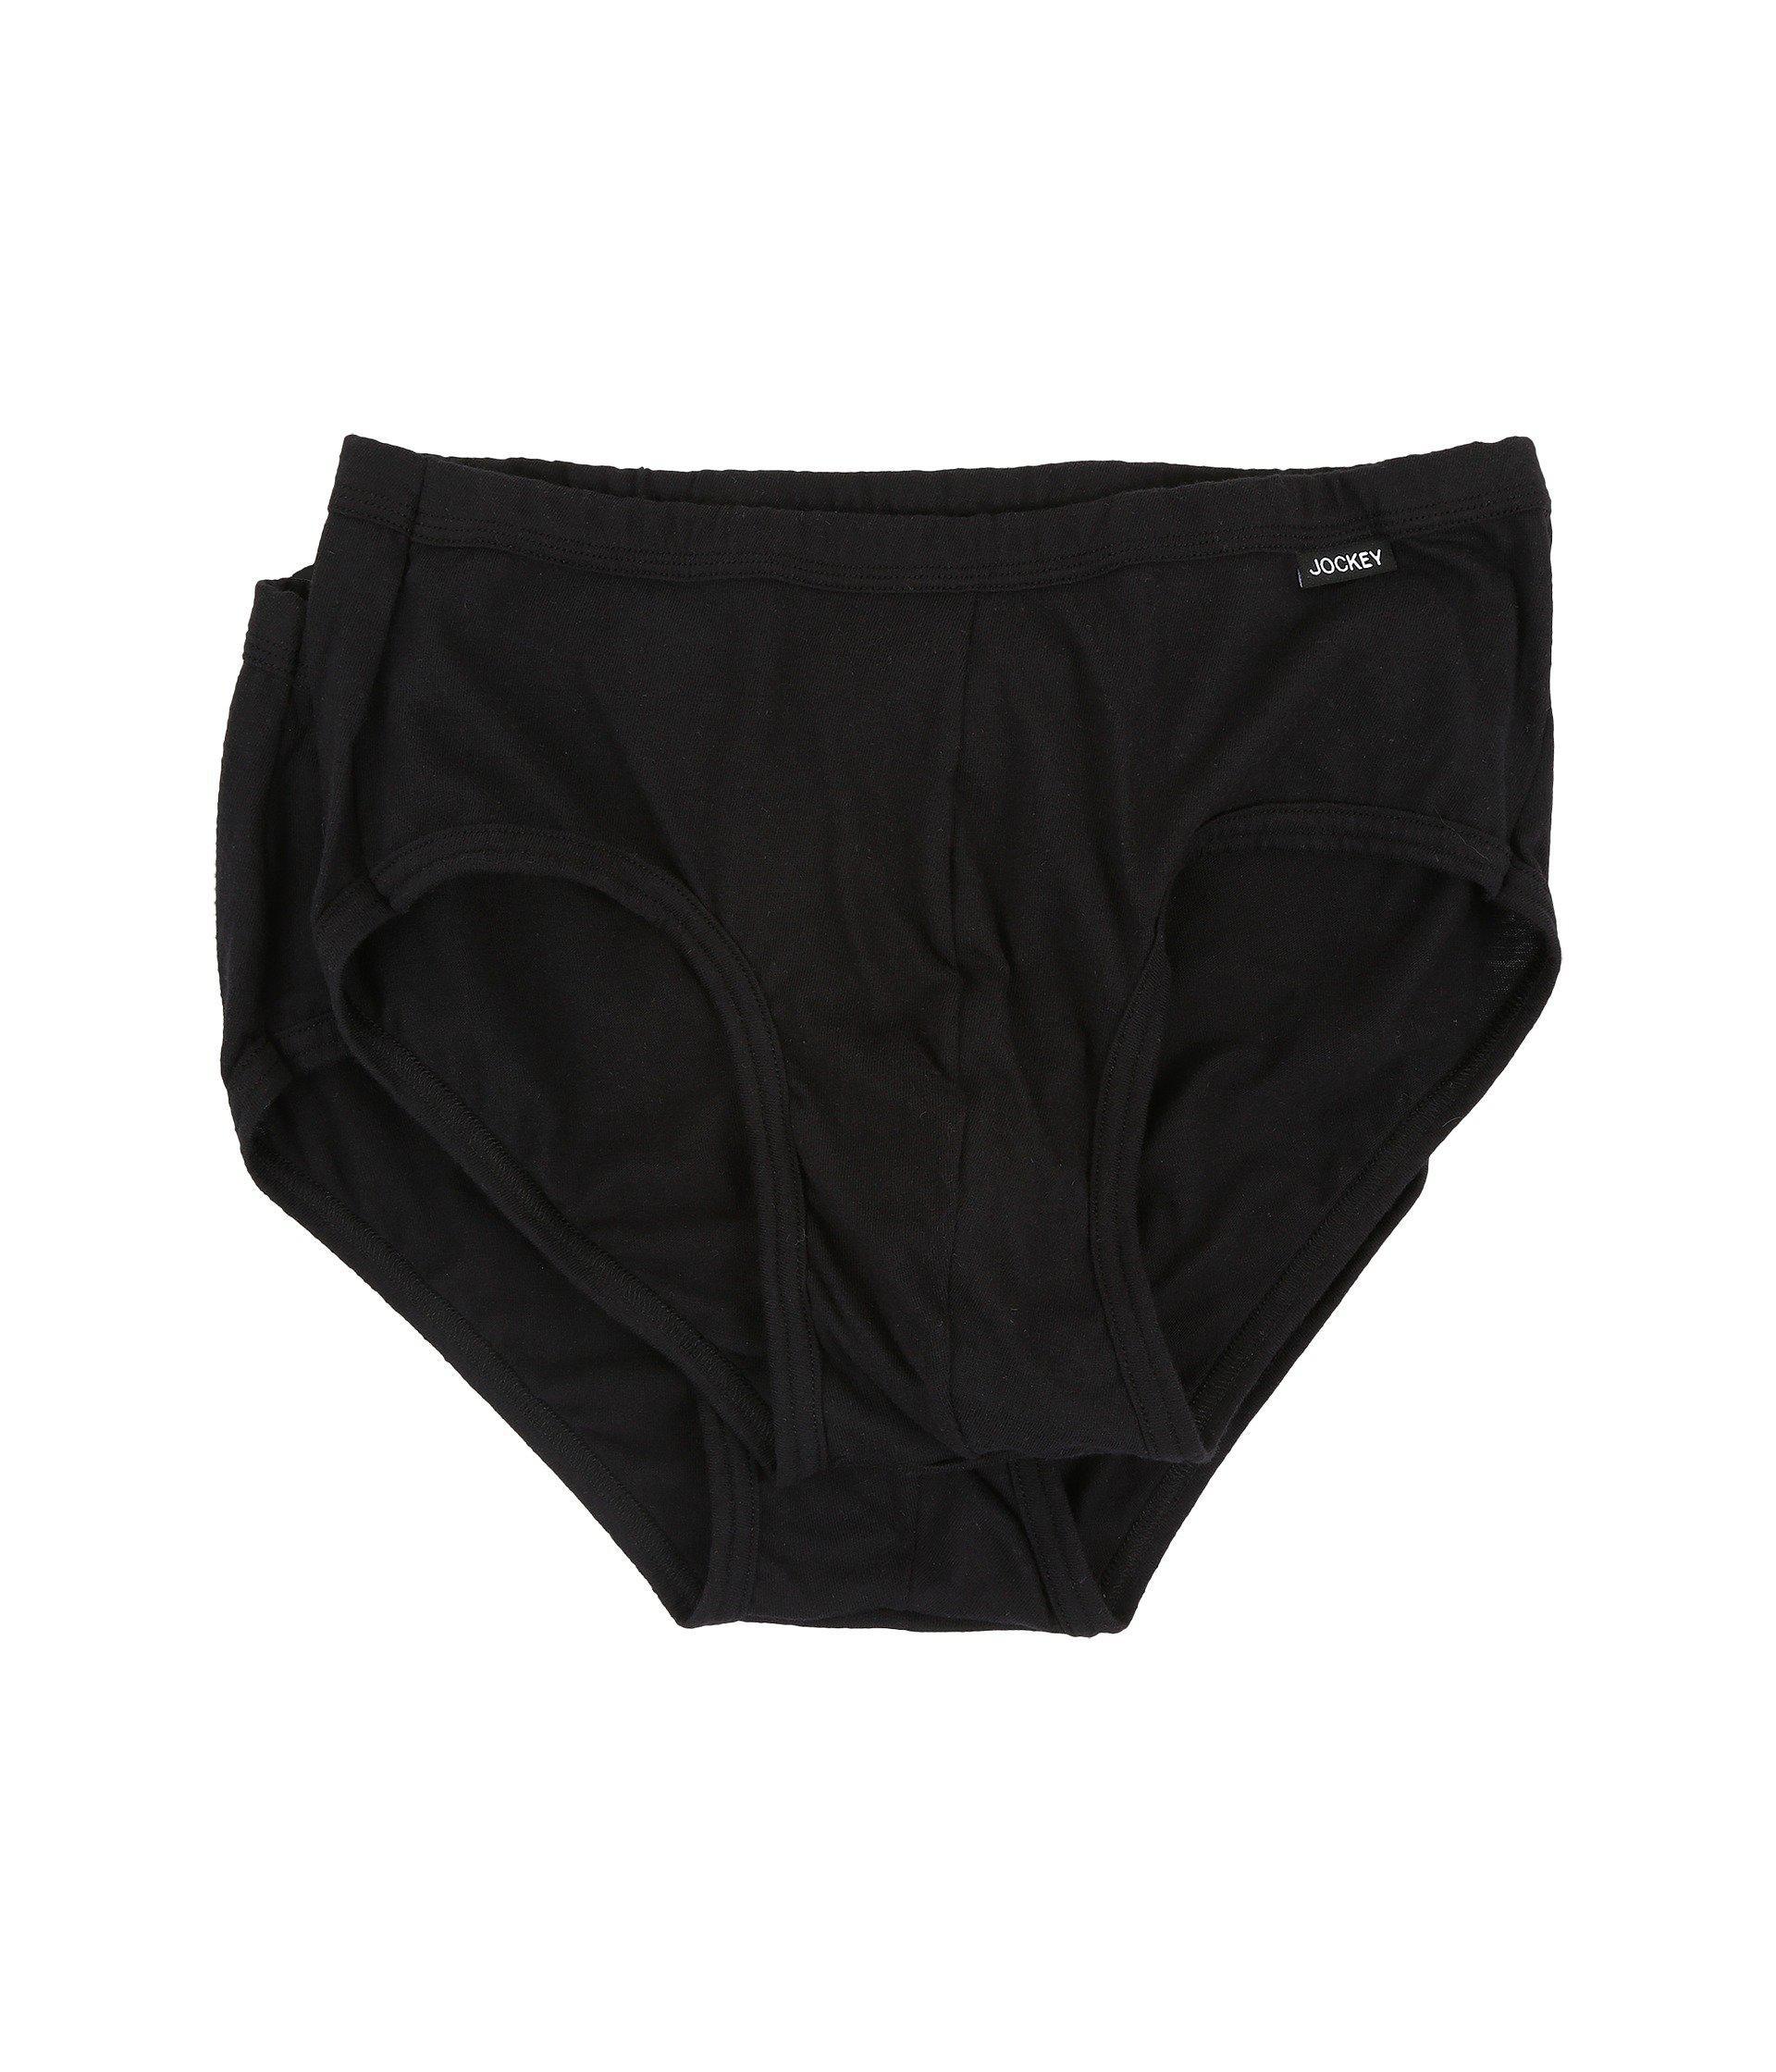 ea2d319d8616 6 Pack Clothing, Shoes & Jewelry Jockey Mens Underwear Mens Elance String  Bikini Bikinis